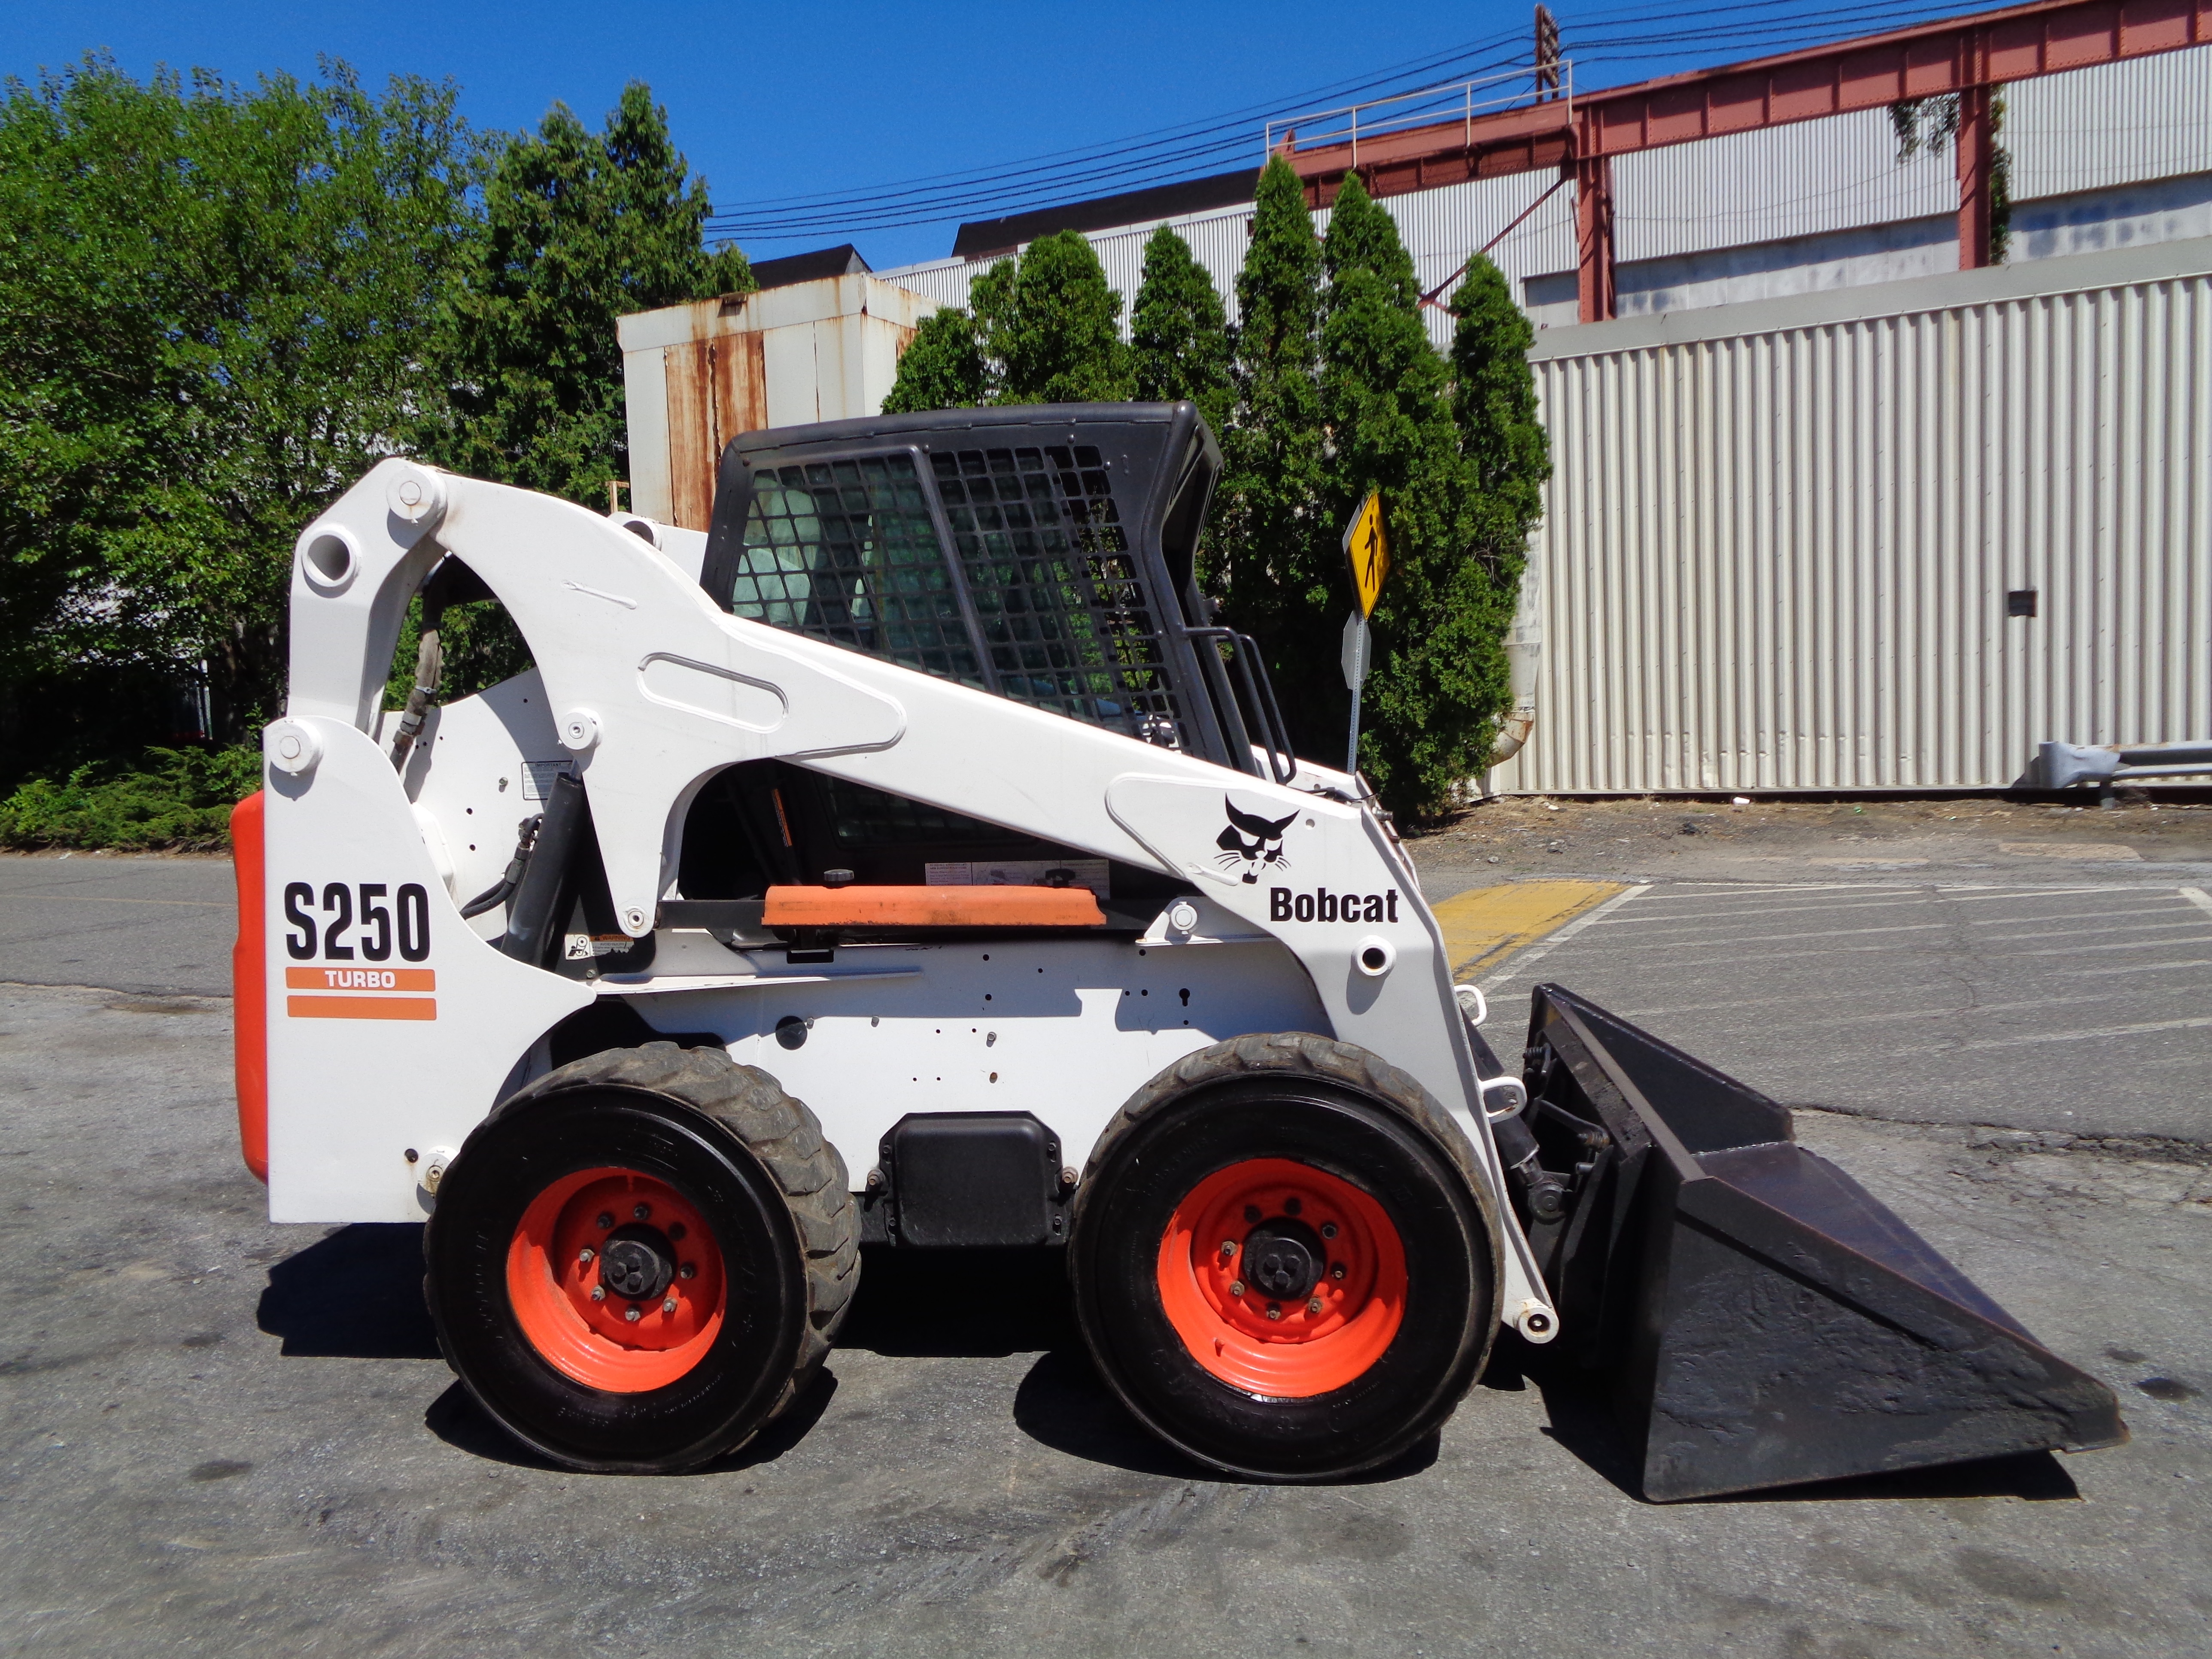 Make: Bobcat Model: S250 SN: 526011056 Diesel Aux Hydraulics